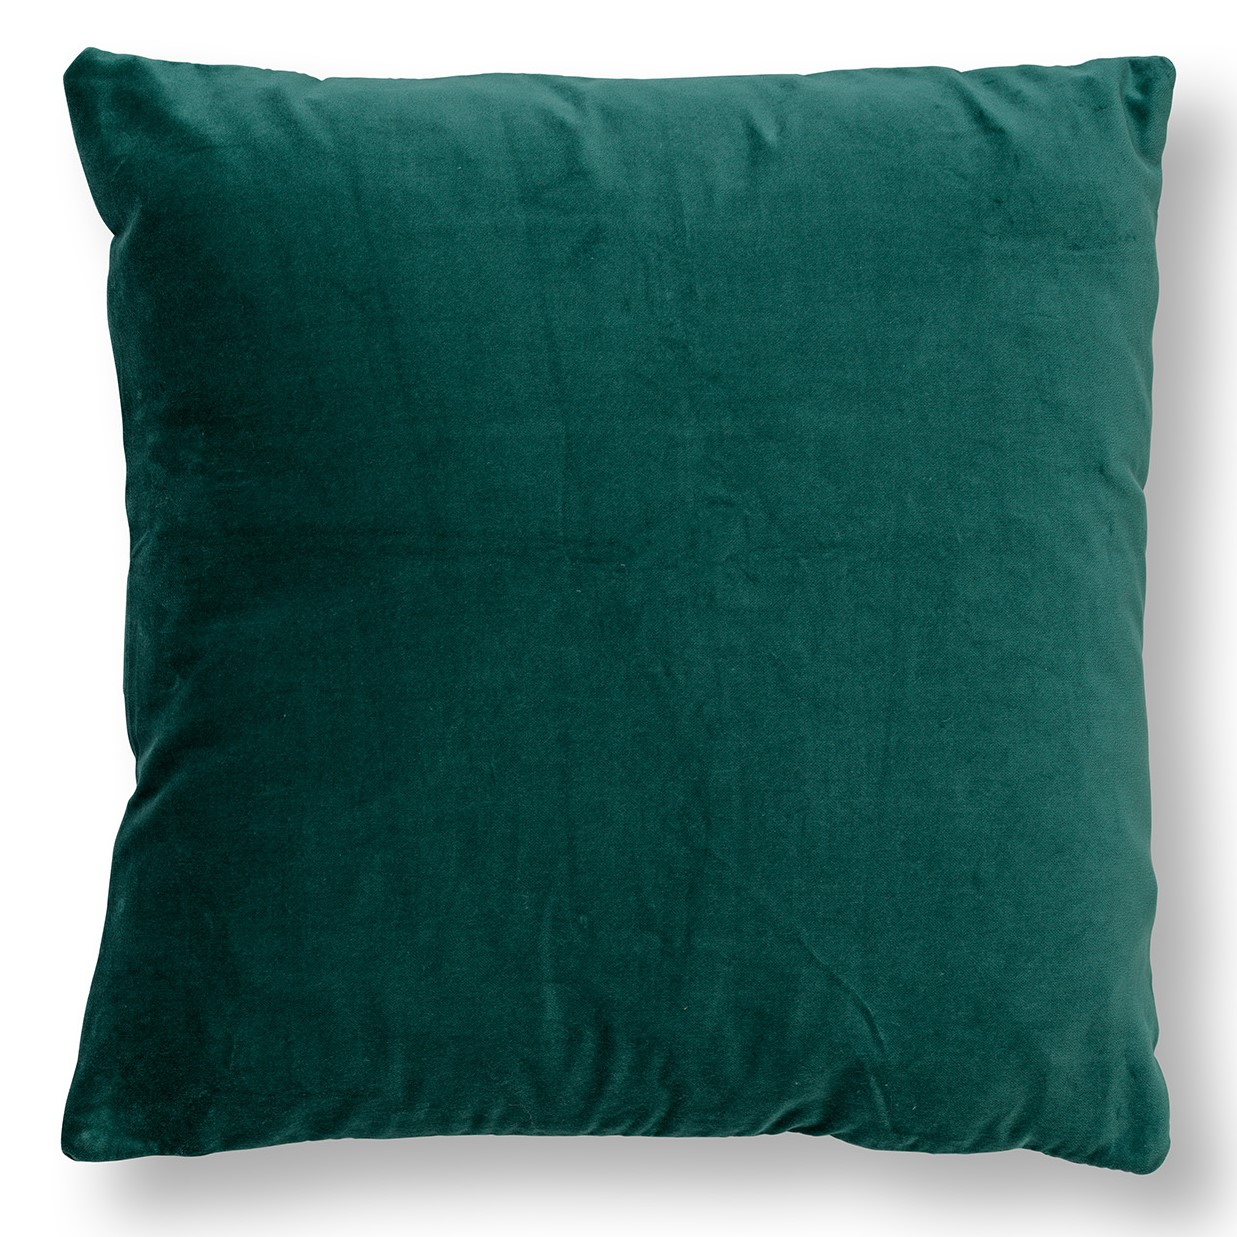 PEMM - Sierkussen velvet Sagebrush Green 45x45 cm